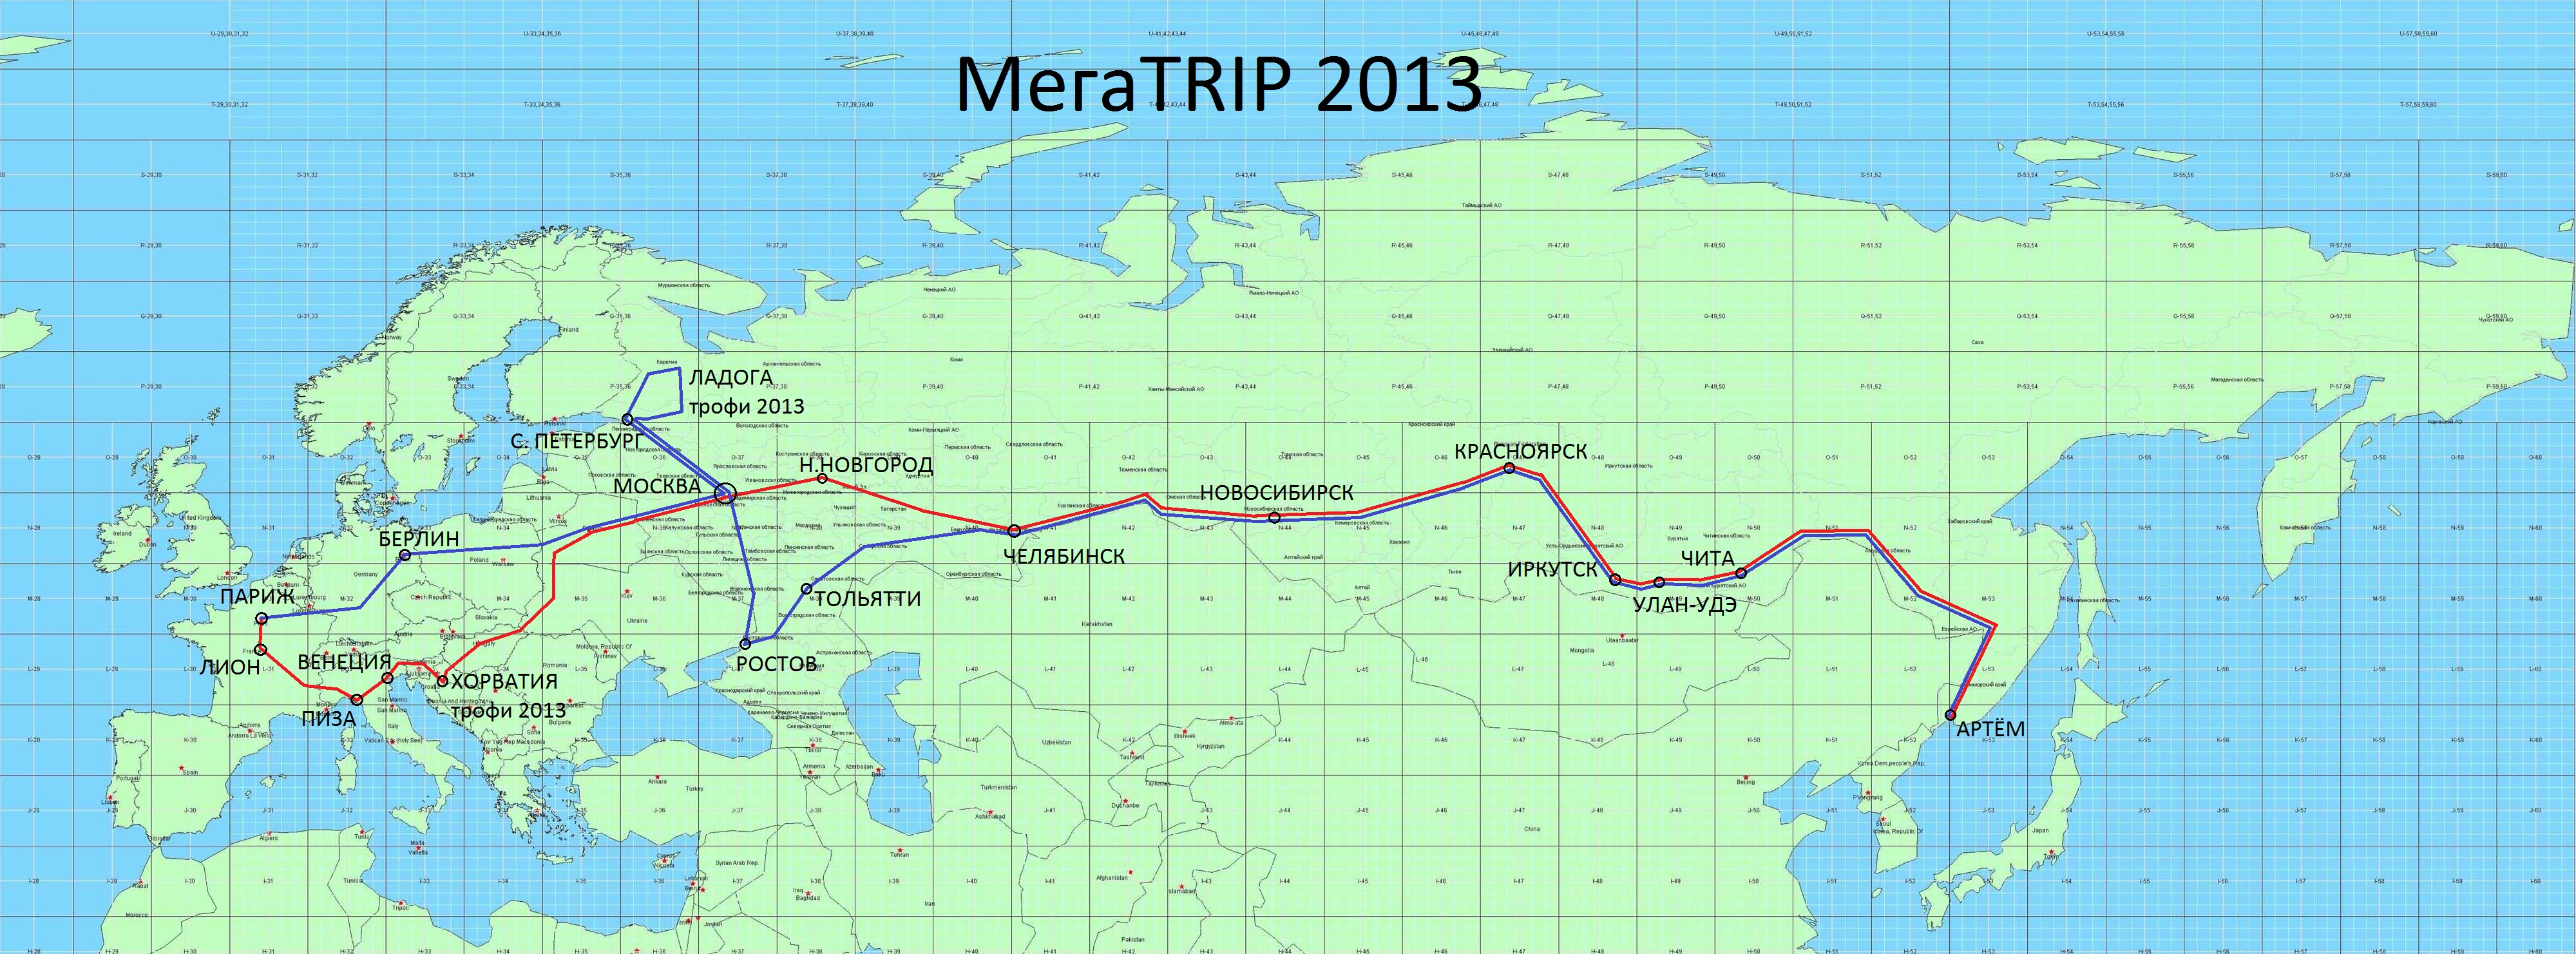 МегаTRIP 2013